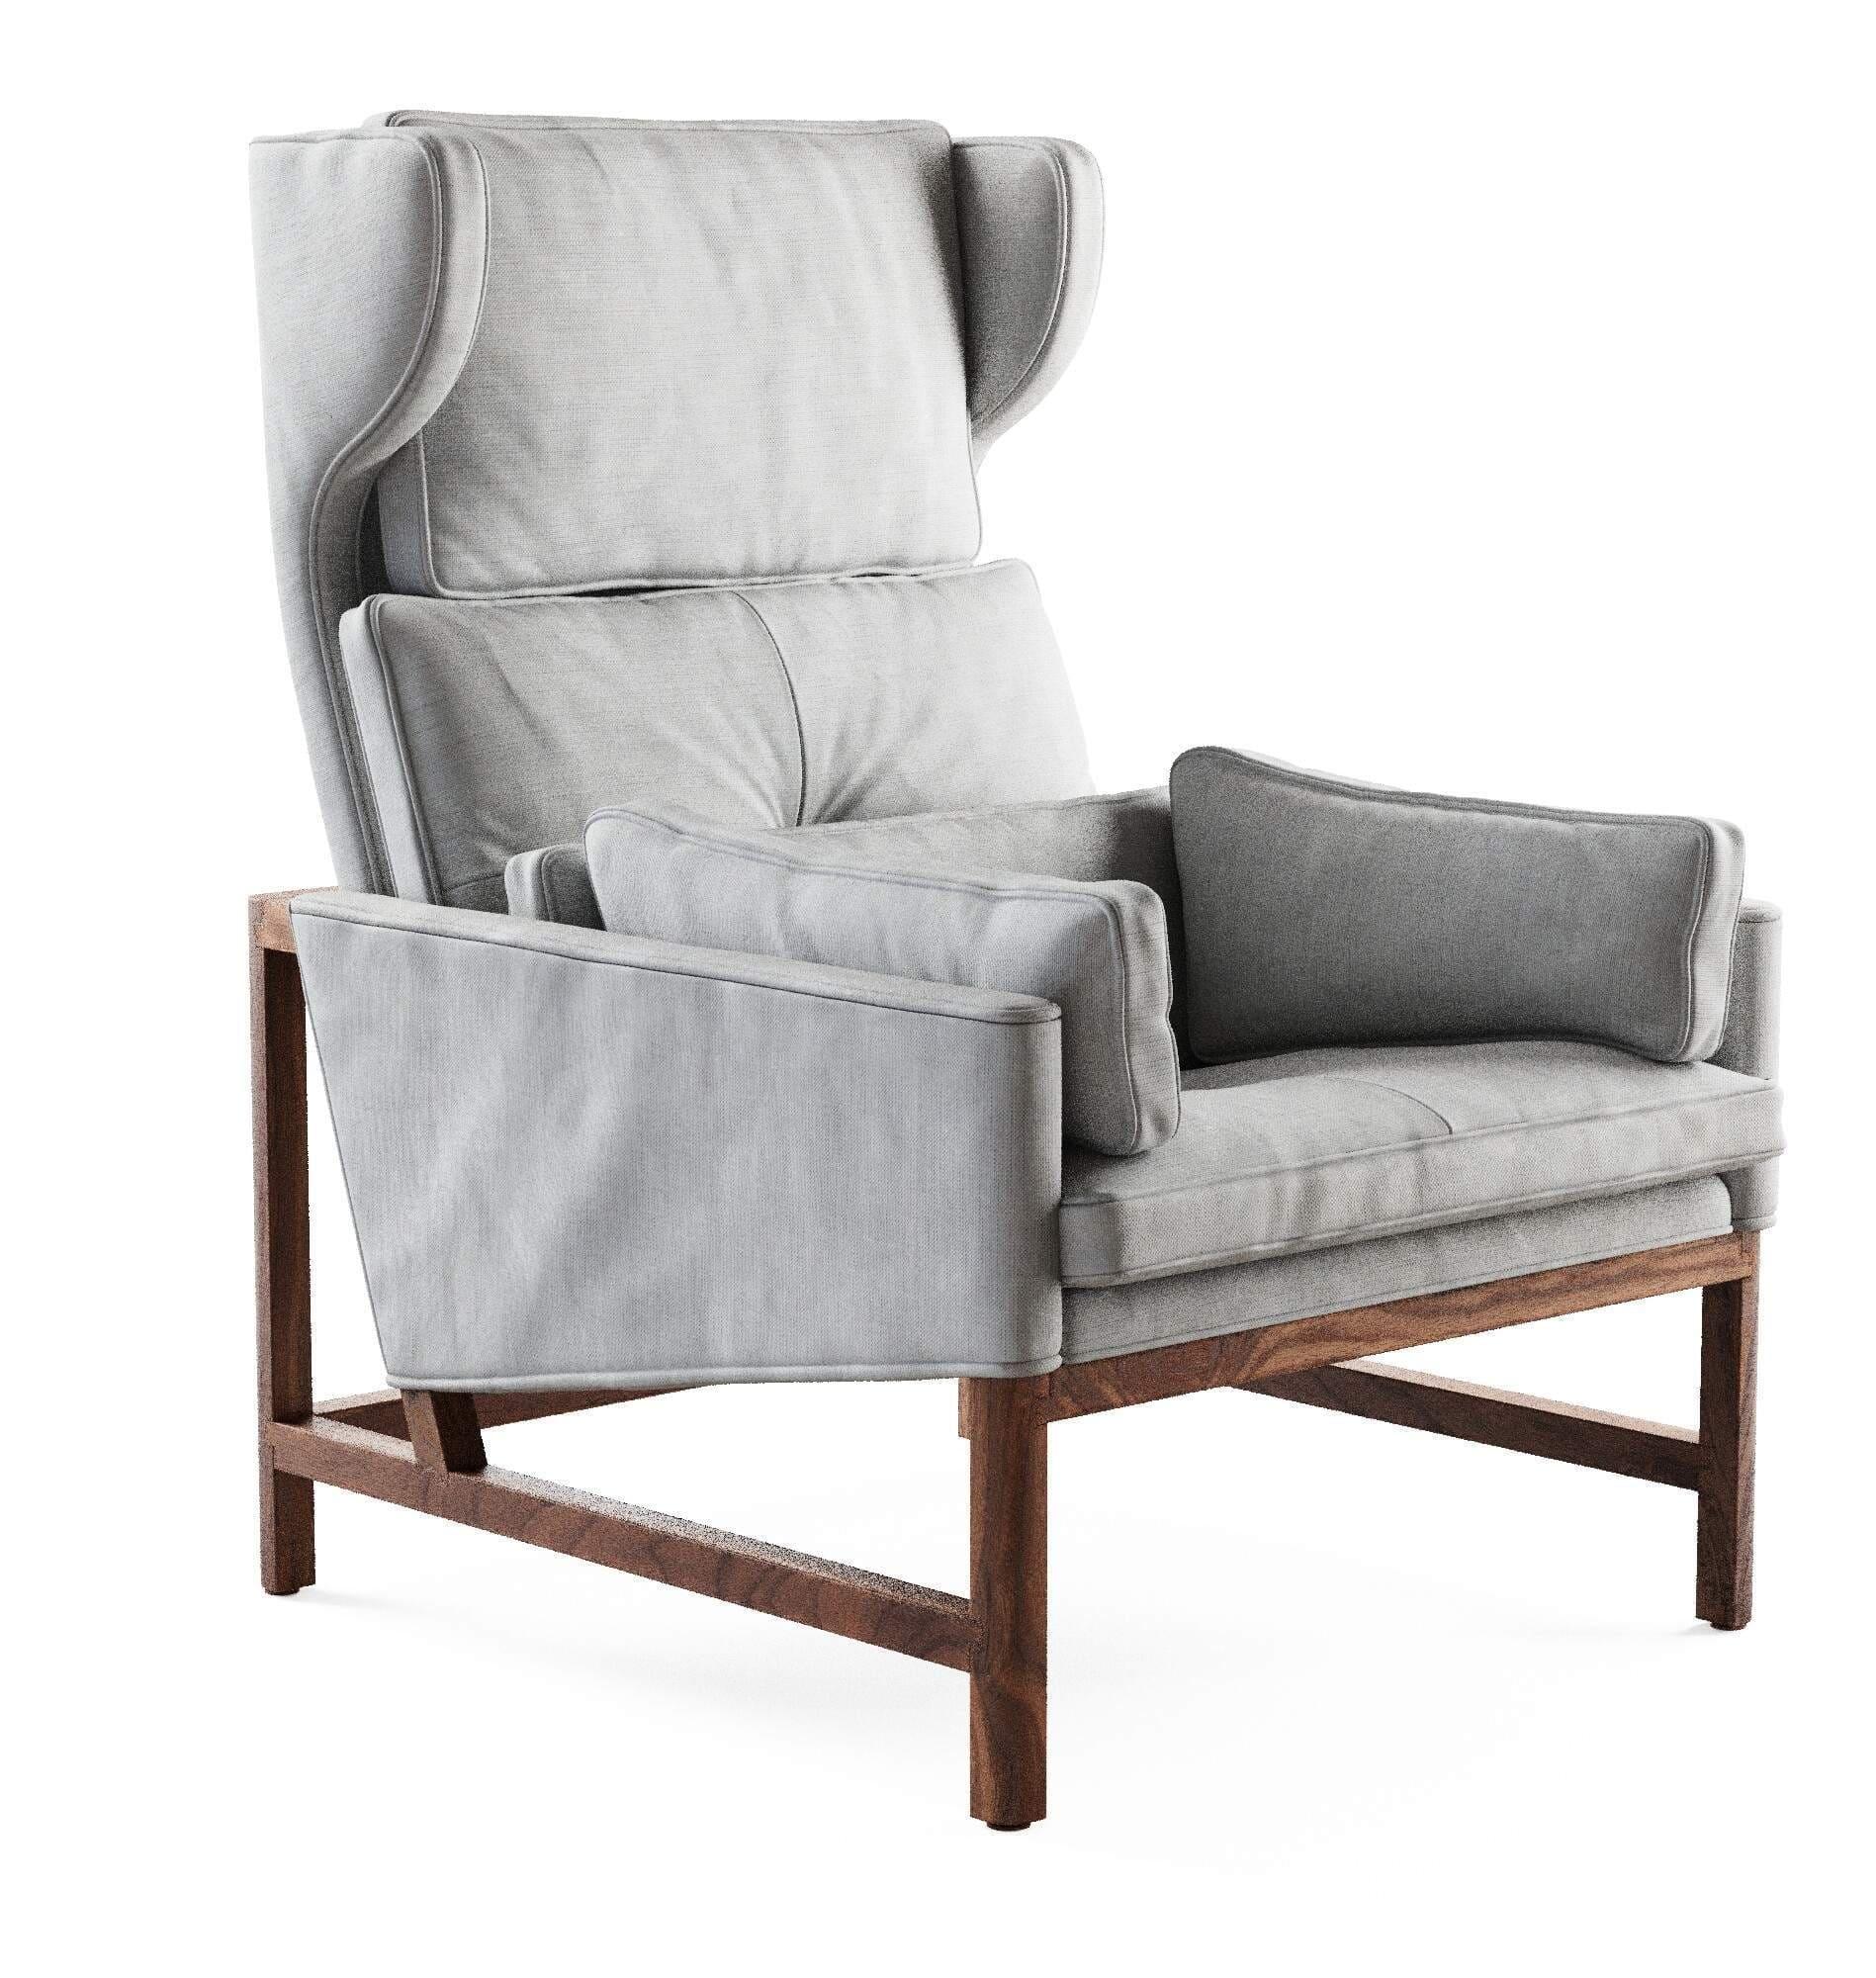 furniture-3d-rendering